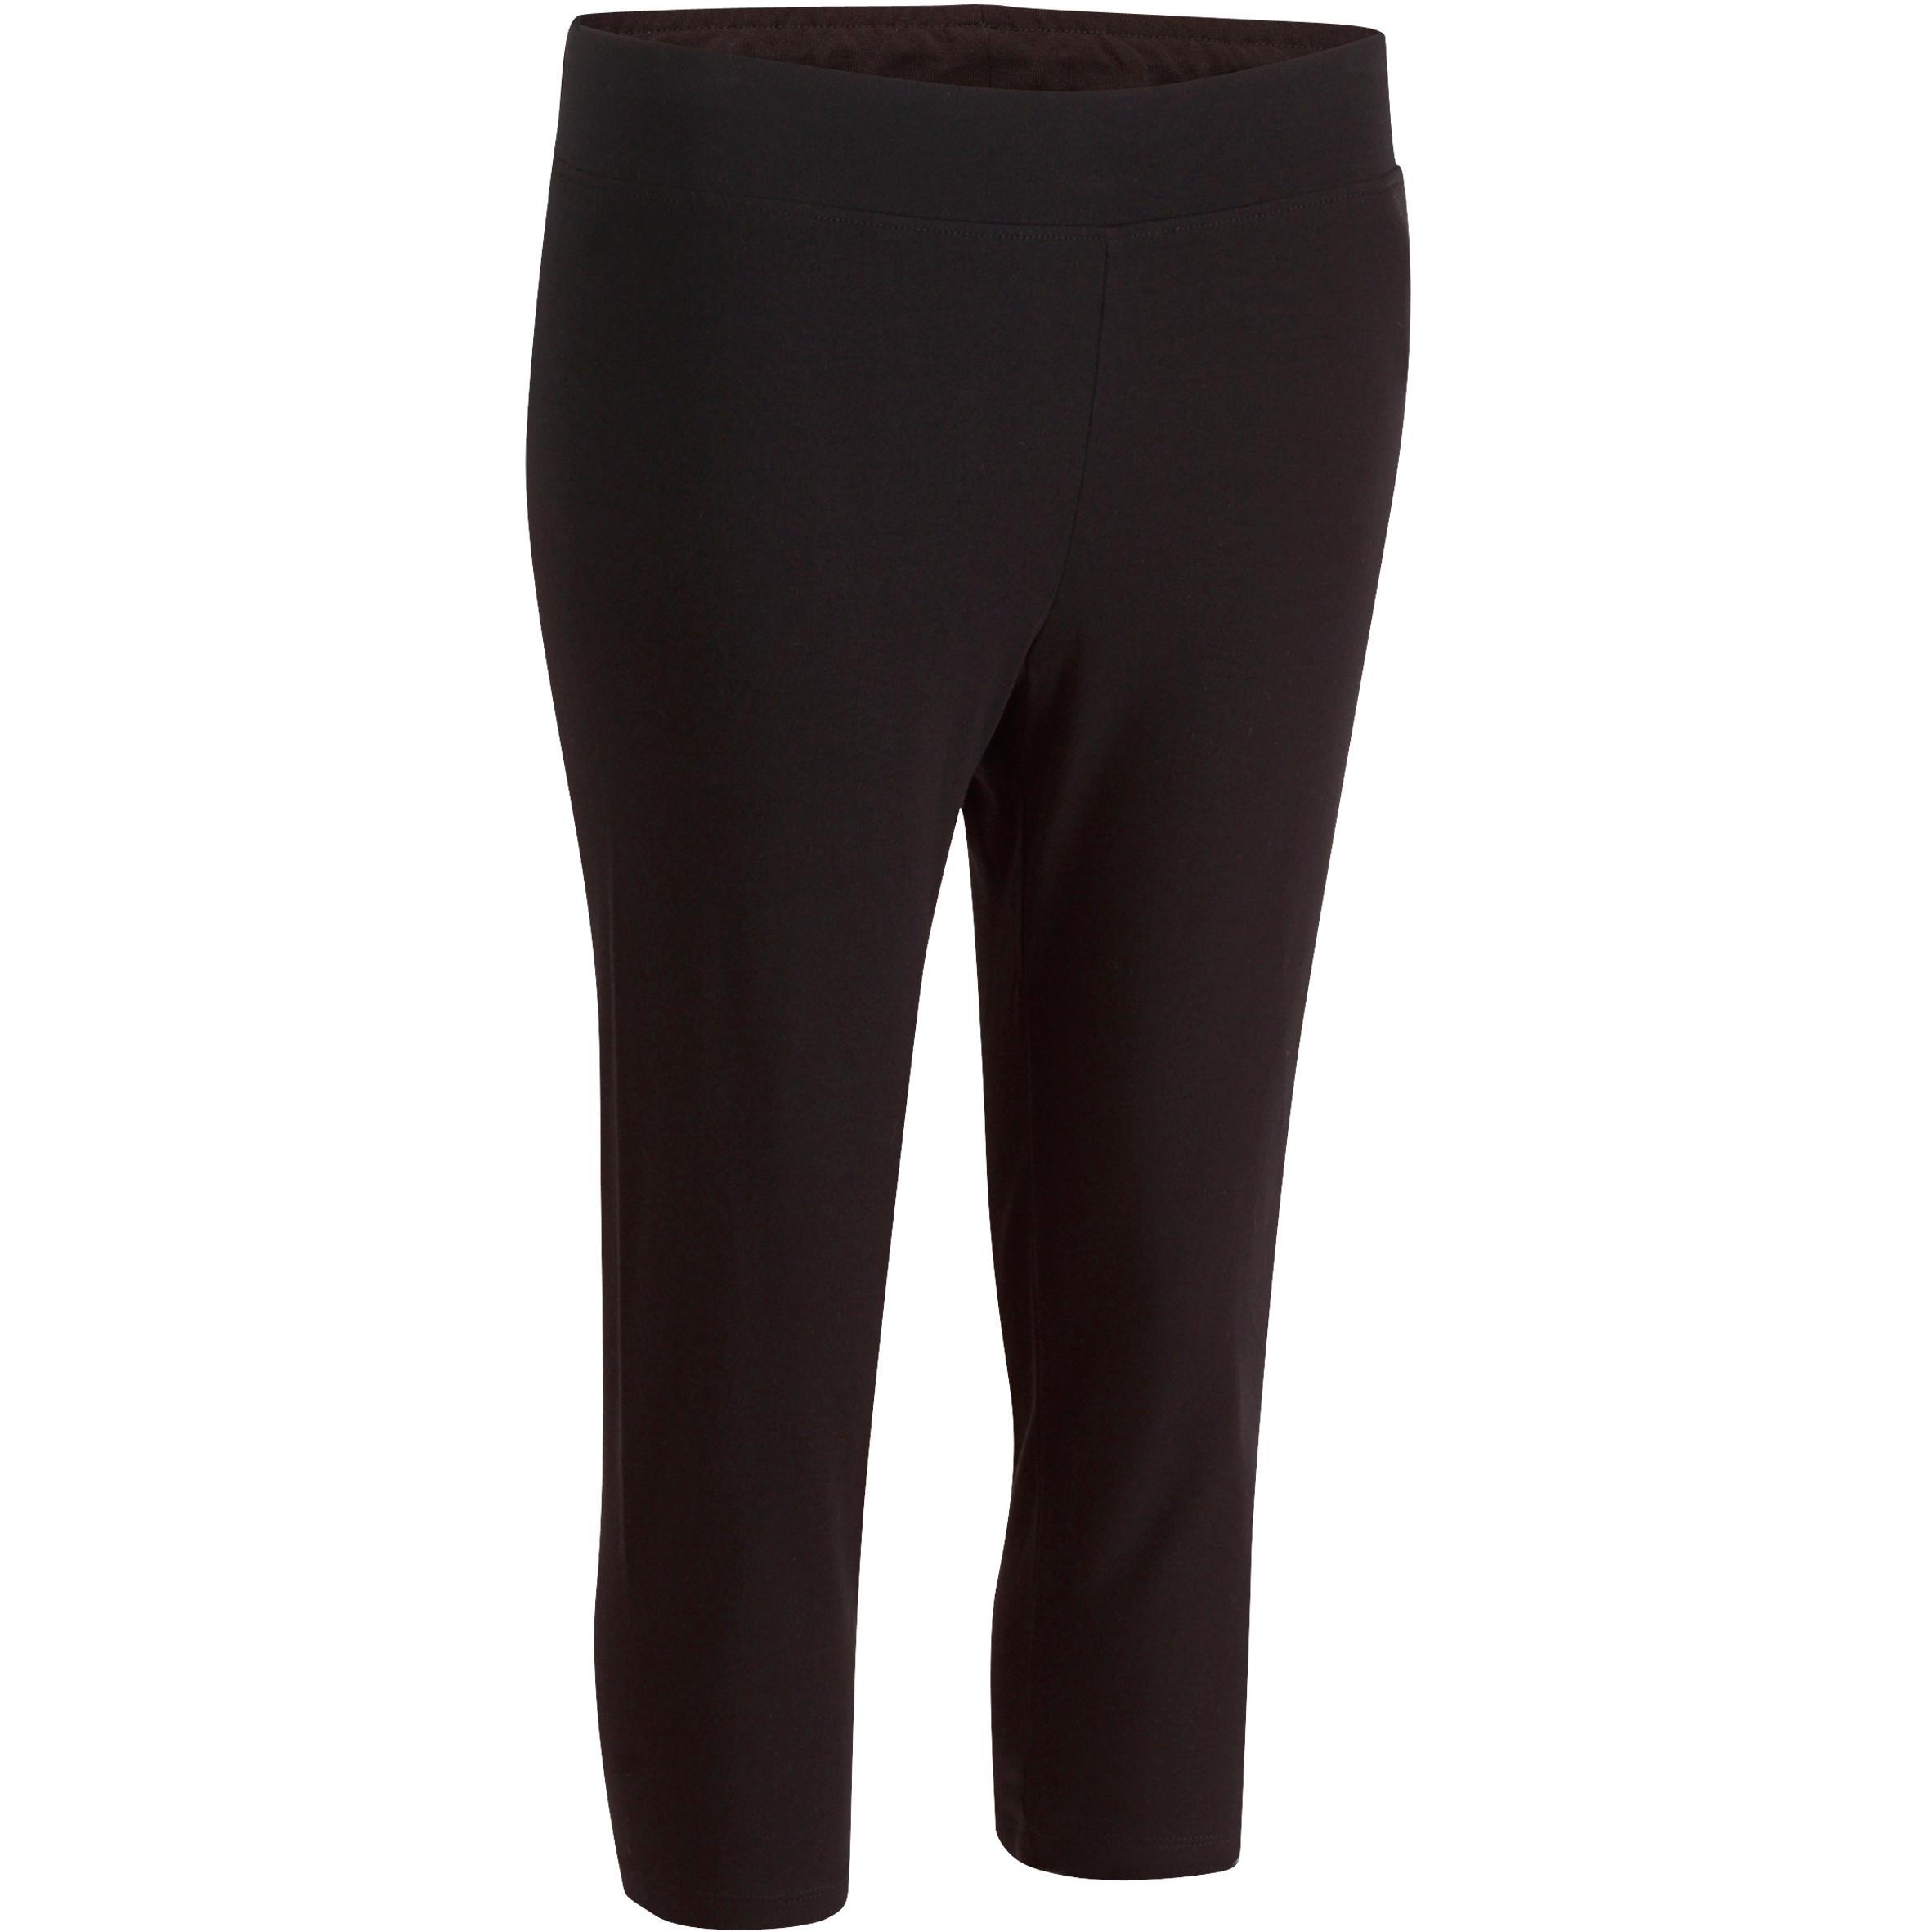 Domyos Kuitbroek Fit+ 500 slim fit pilates en lichte gym dames zwart